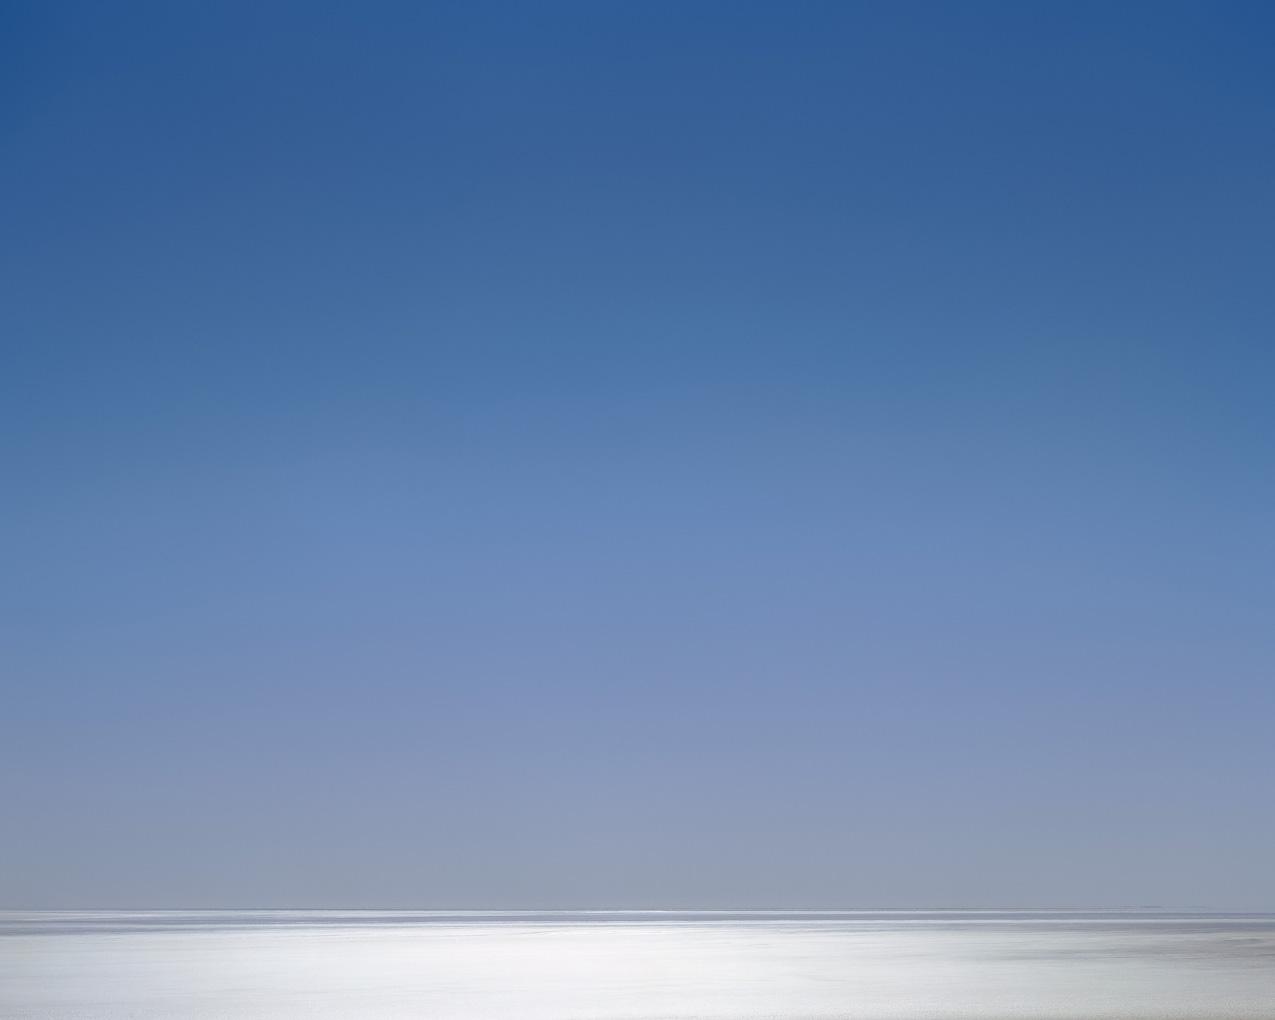 Salt 30, 120cm x 150cm, digital pigment print on cotton rag, edition of 7, 2005